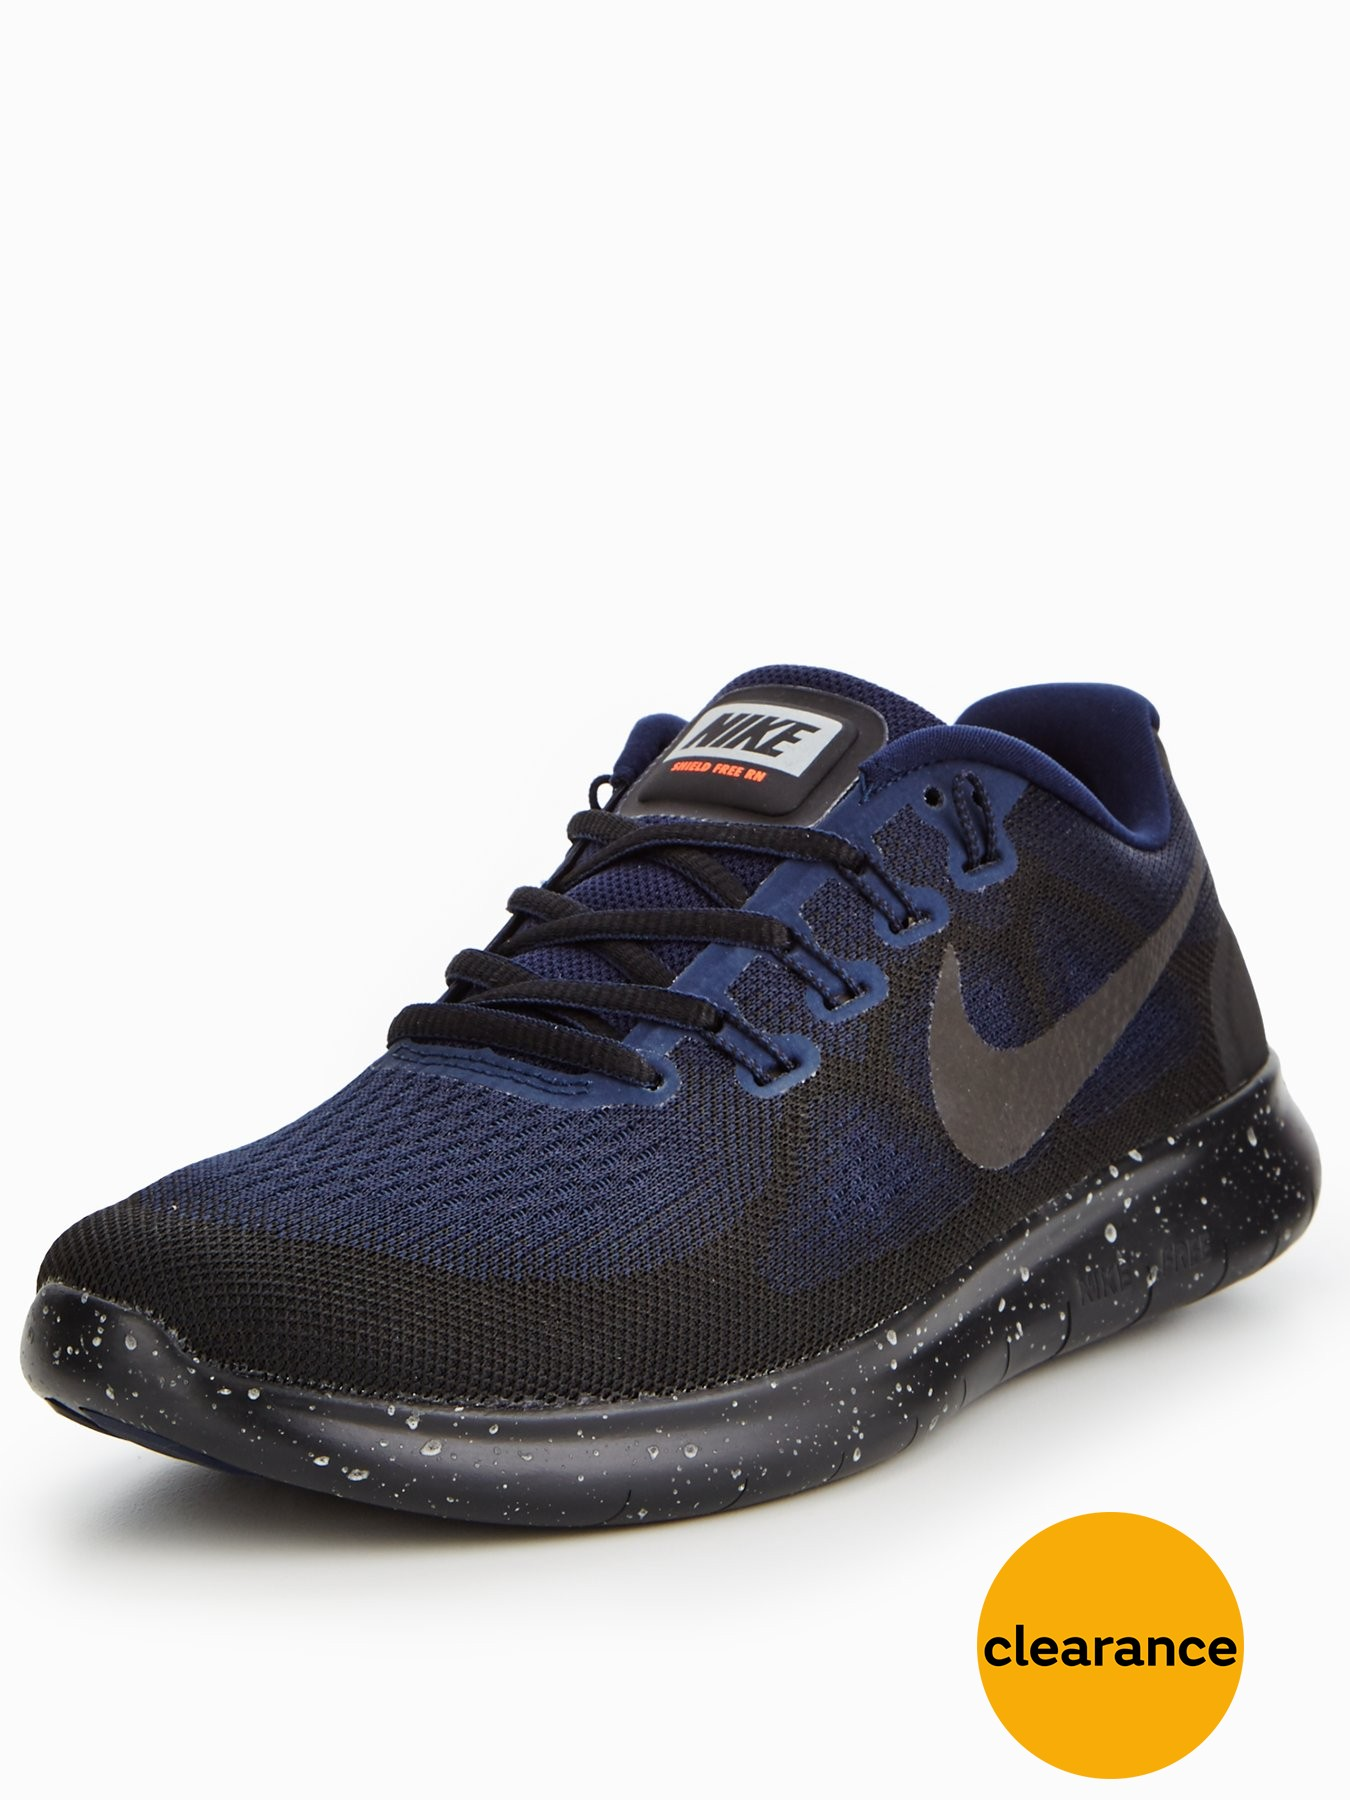 Nike Free RN 2017 Shield Navy/Black 1600179788 Women's Shoes Nike Trainers